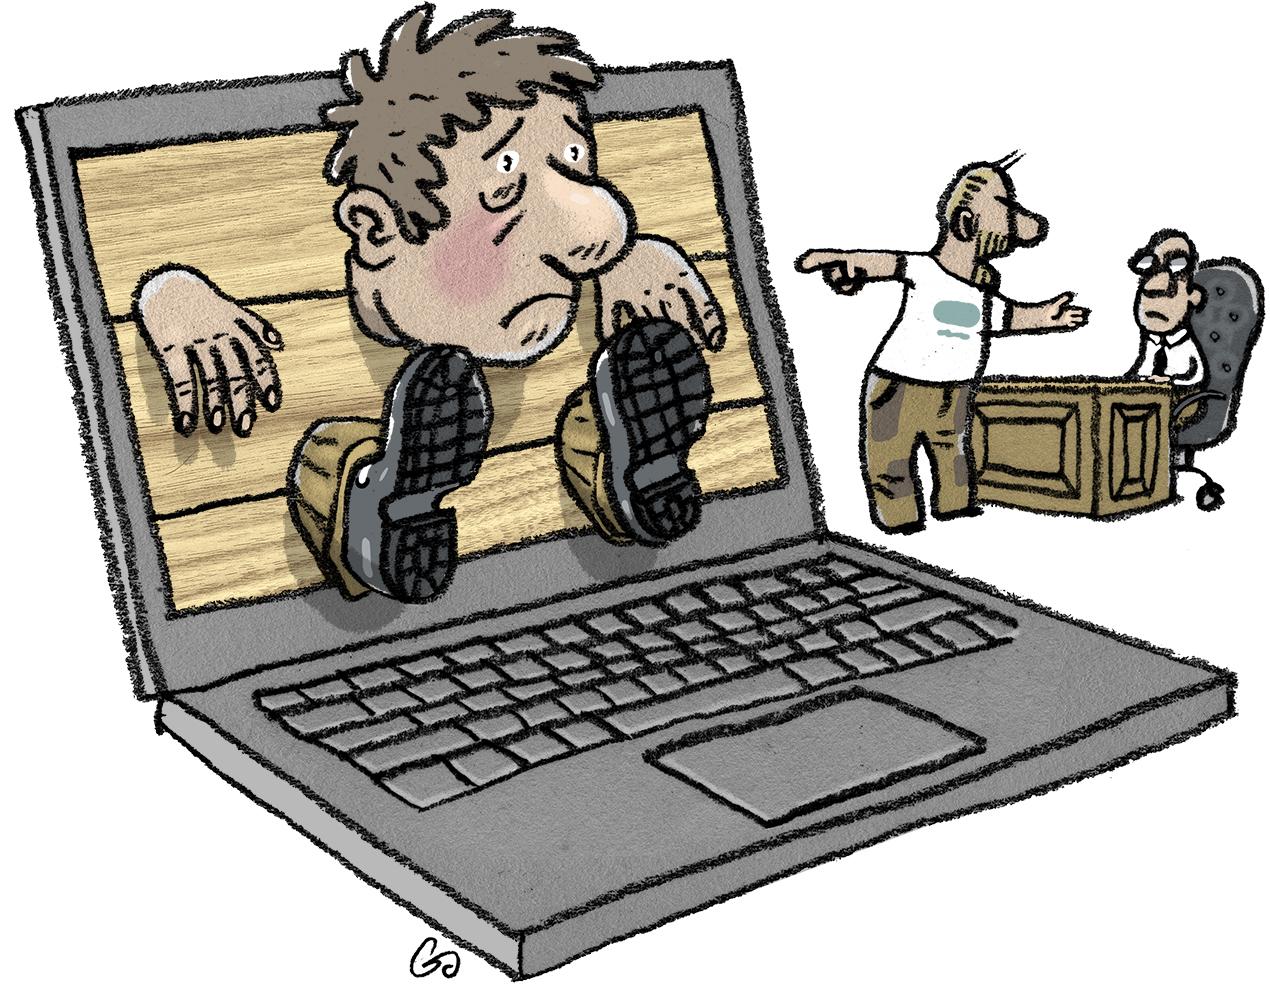 Cyberchikane